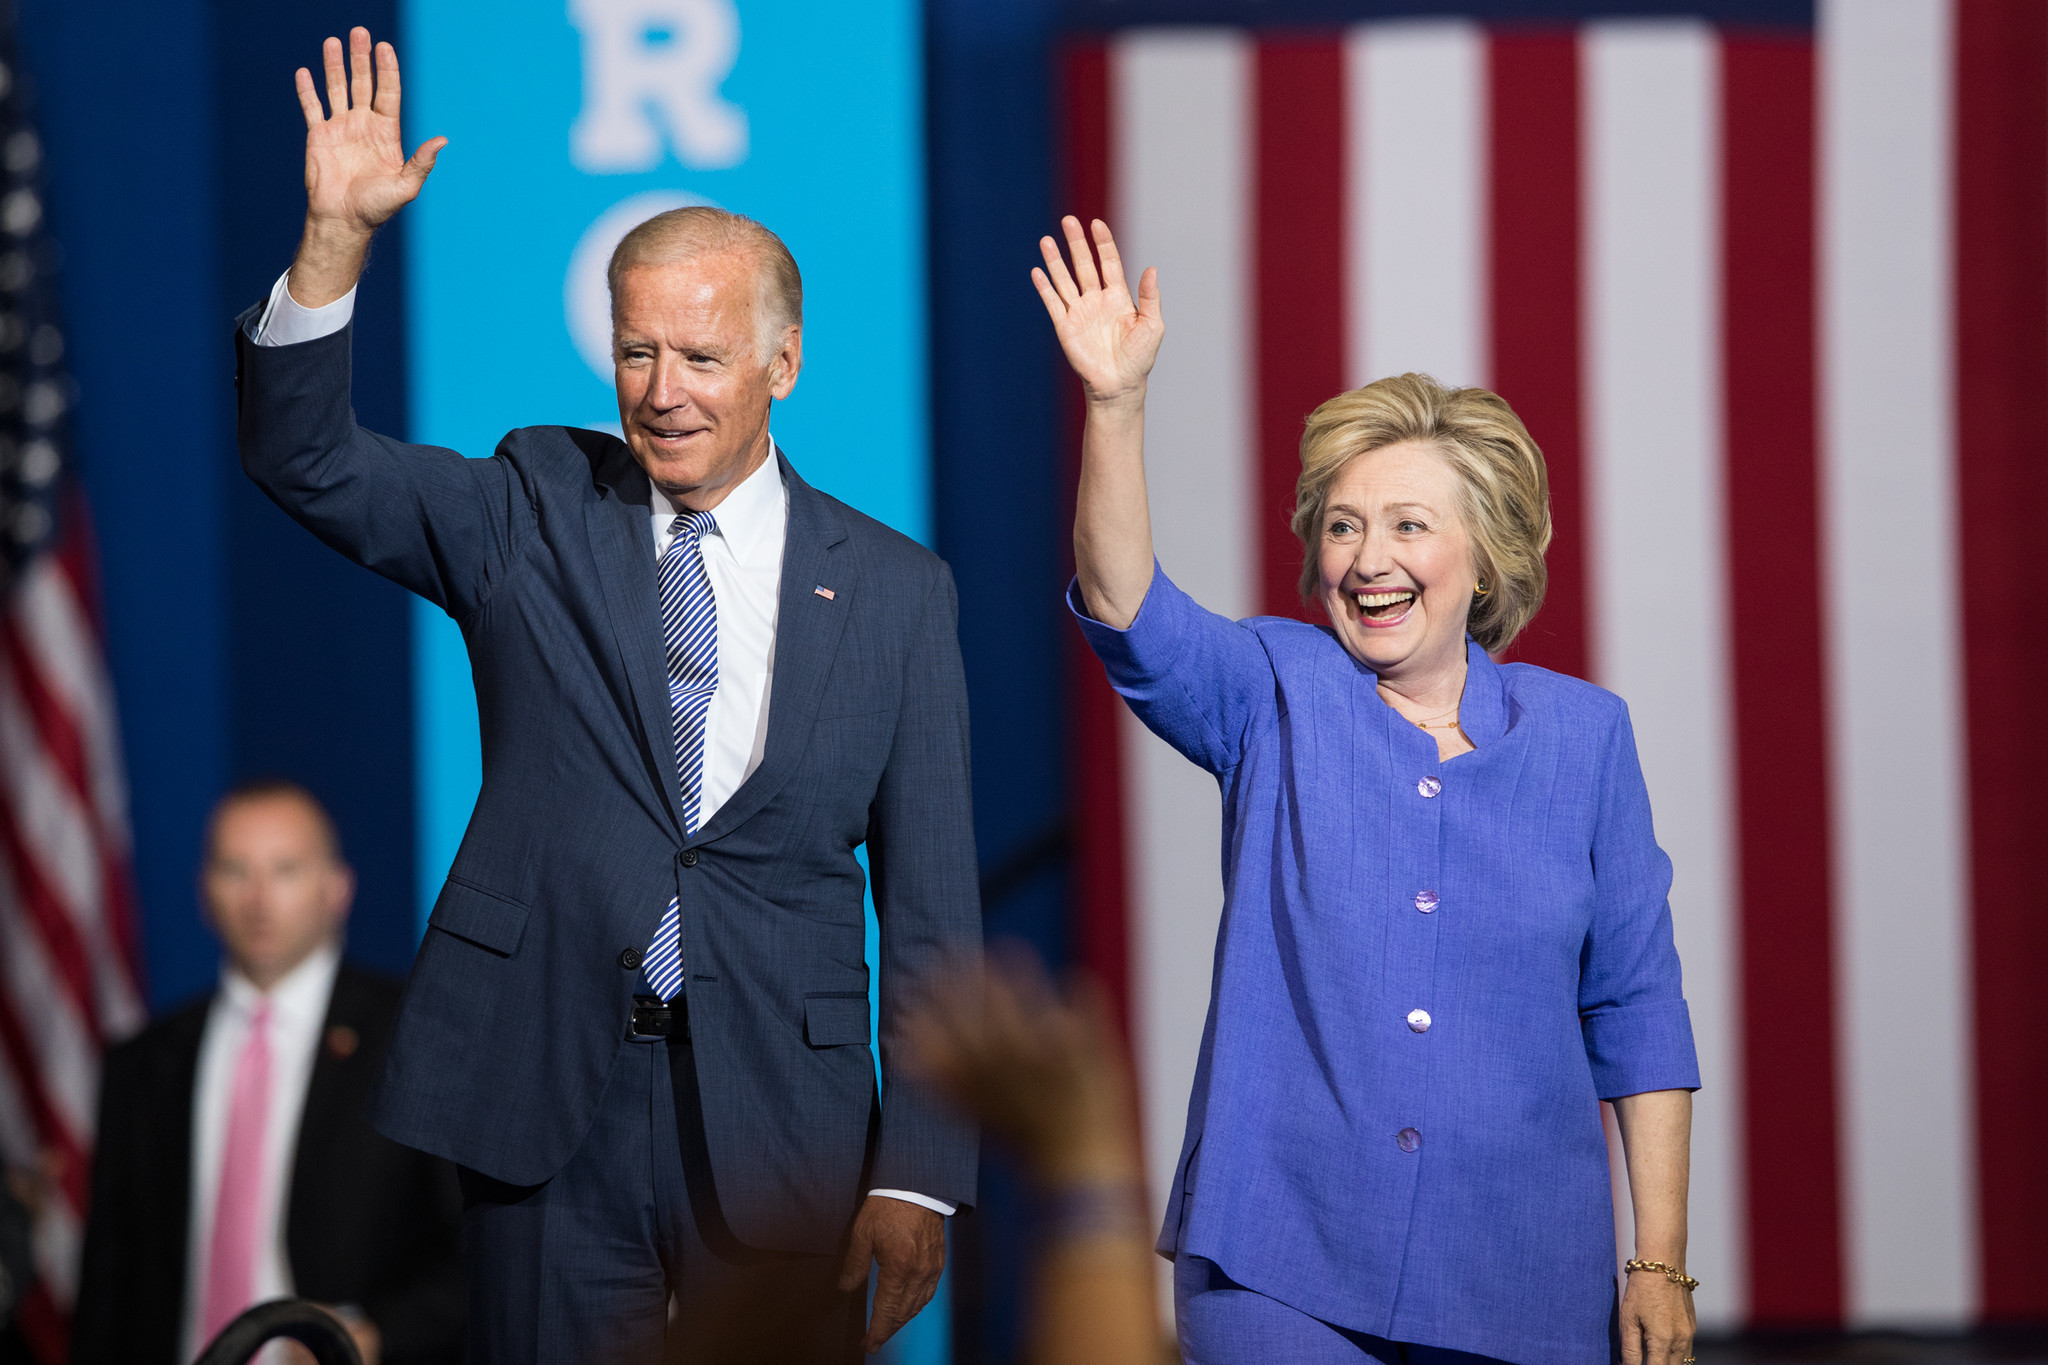 Joe Biden never thought Hillary Clinton was a very good